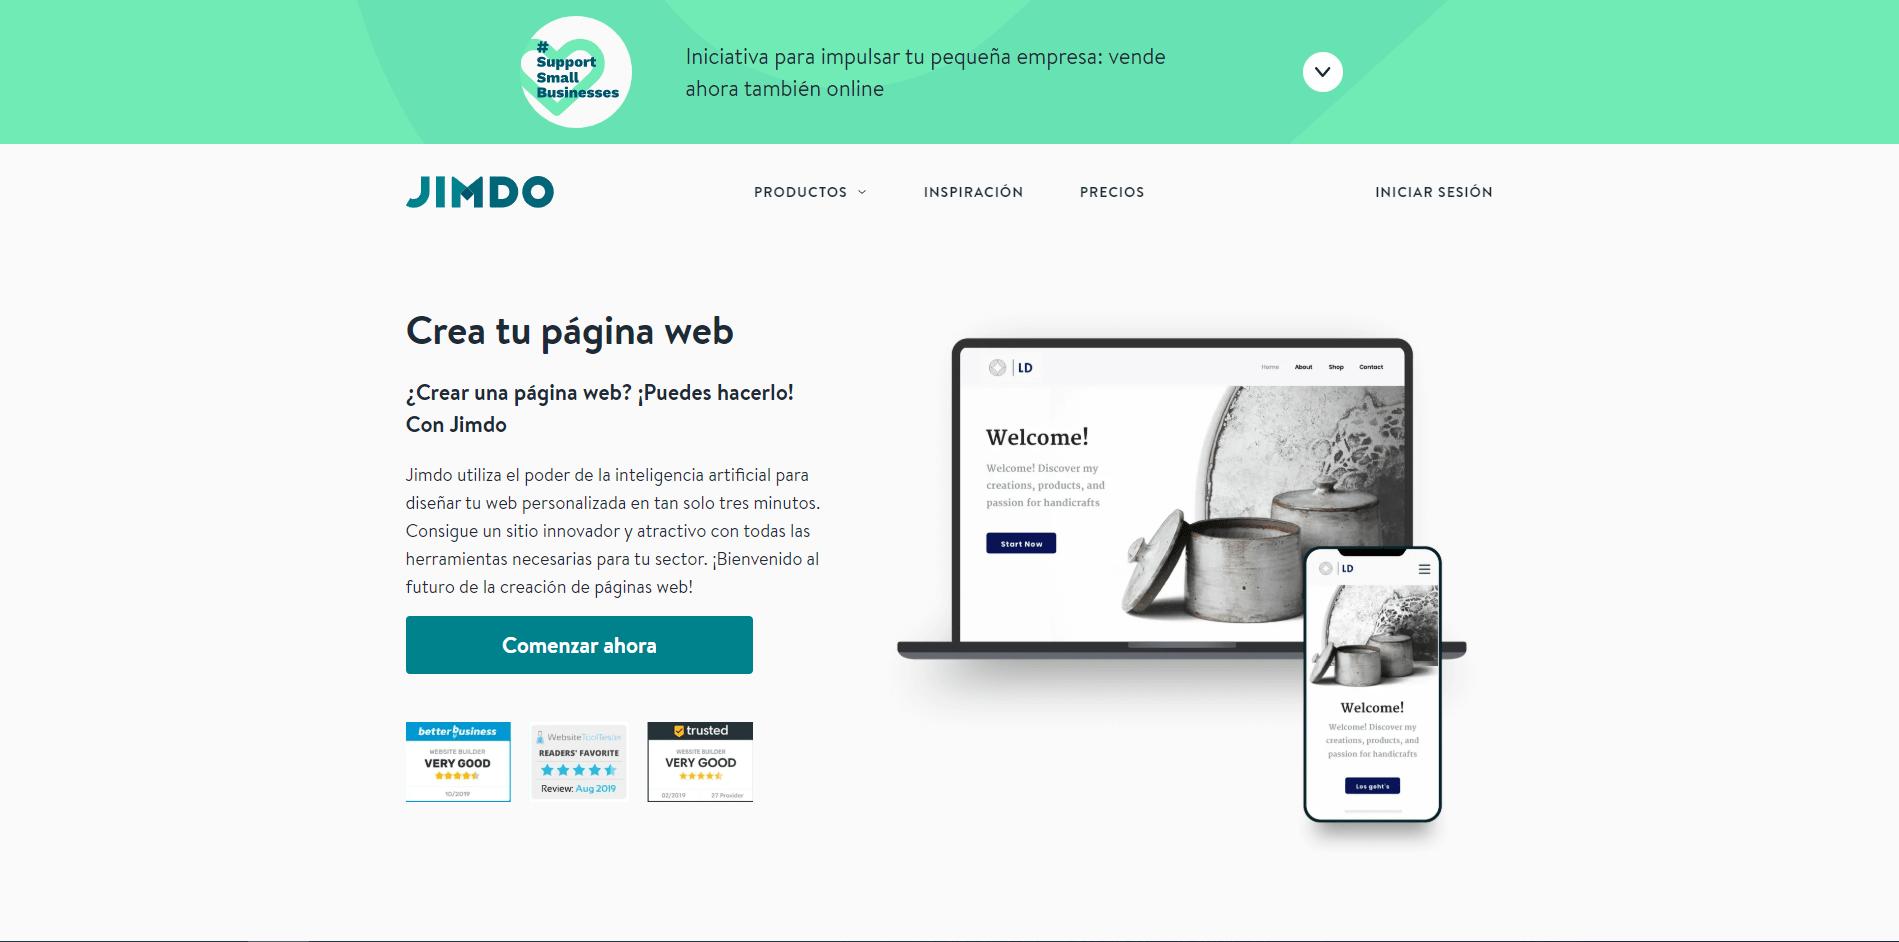 Jimdo homepage